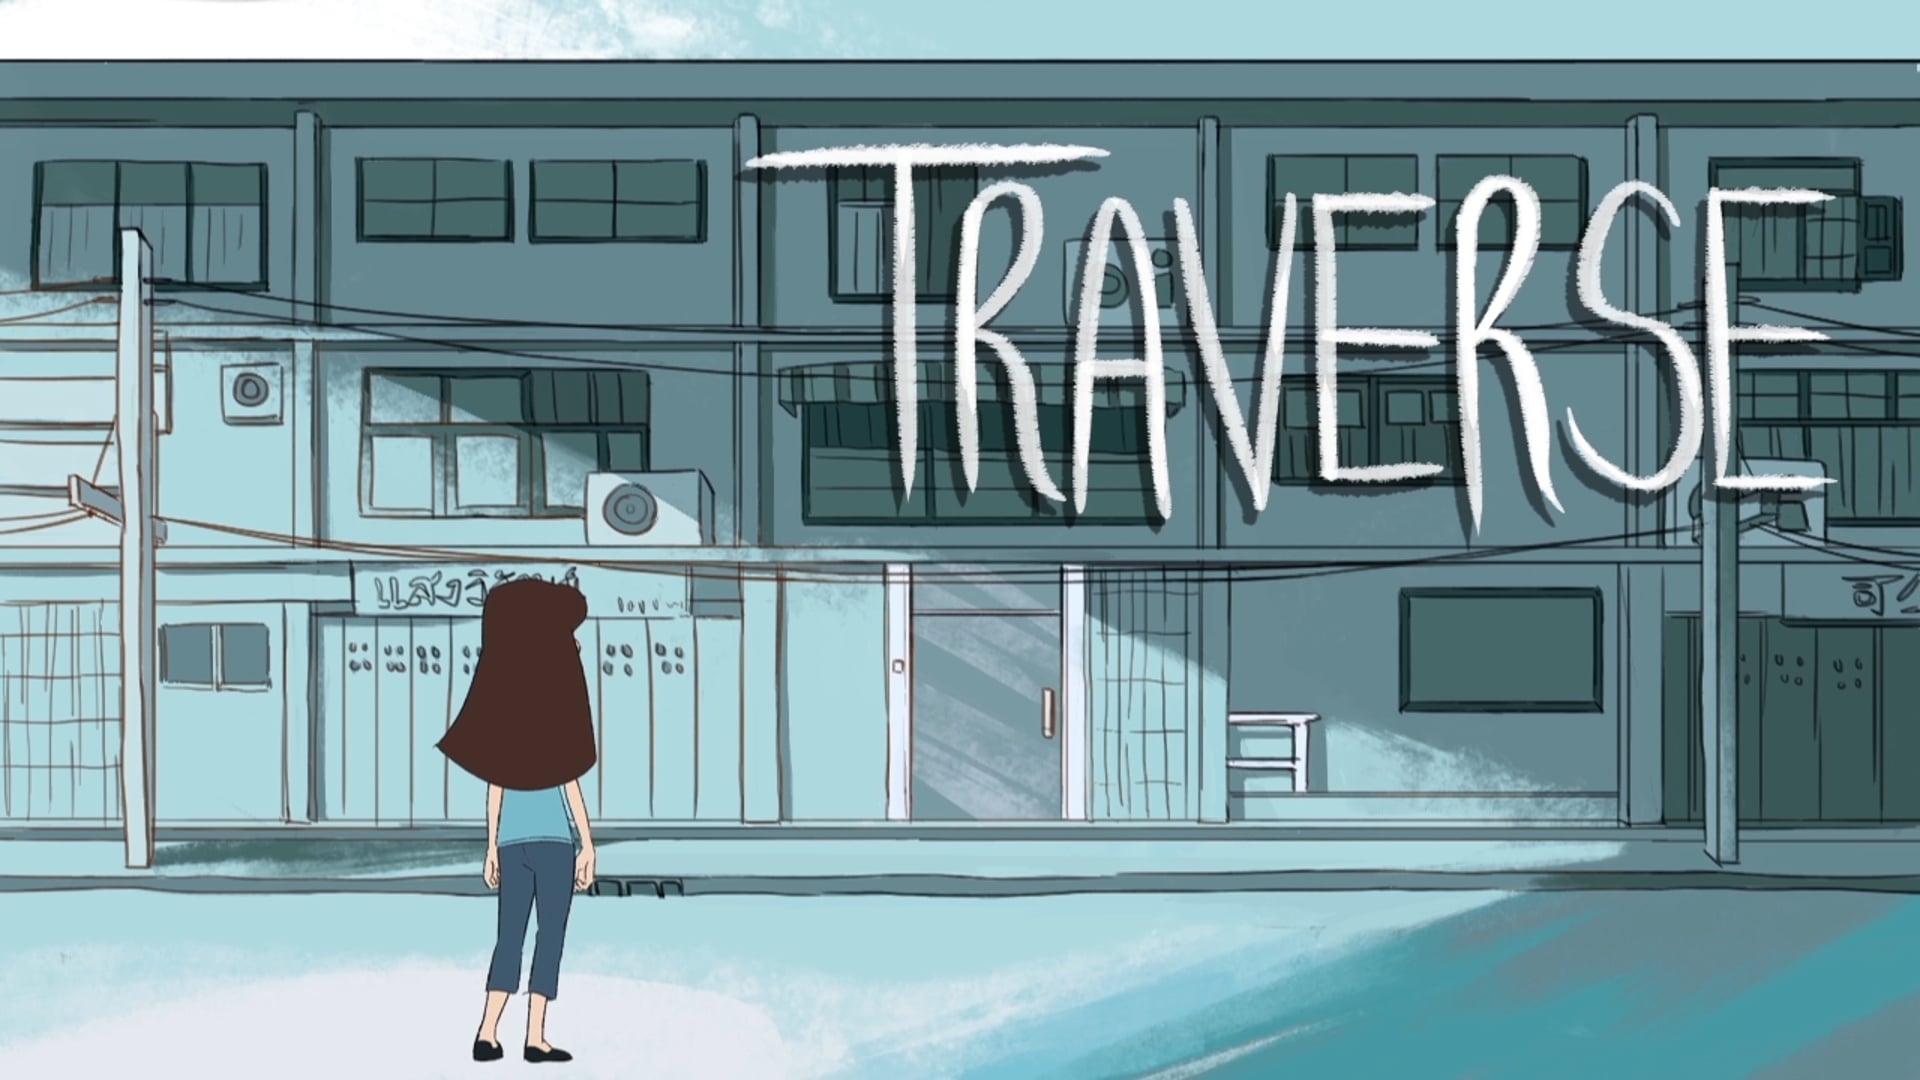 TRAVERSE (2016)